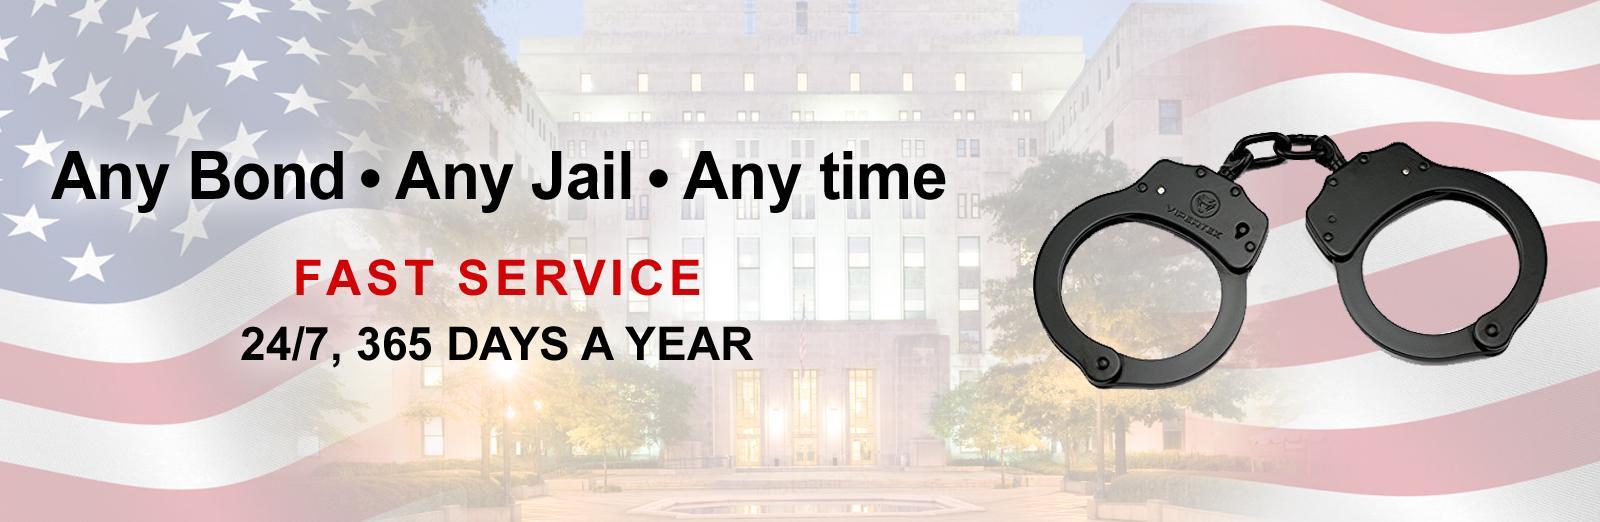 quick-release-bail-bonds-company-birmingham-al